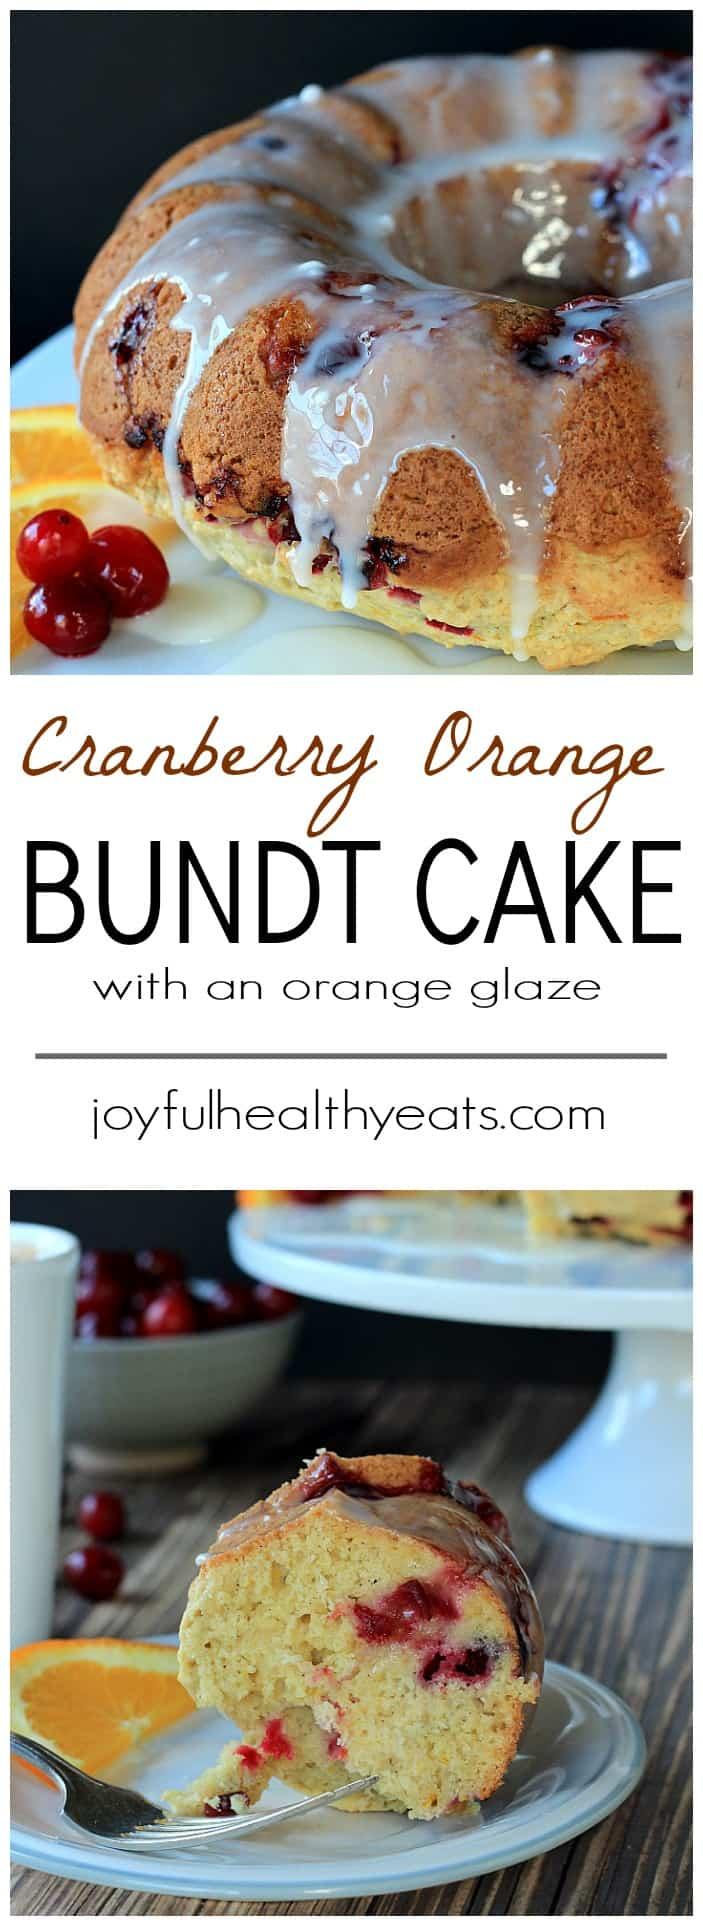 A fresh tart Cranberry Orange Bundt Cake topped with a sweet Orange Glaze! Its the perfect dessert recipe for the holidays. | www.joyfulhealthyeats.com